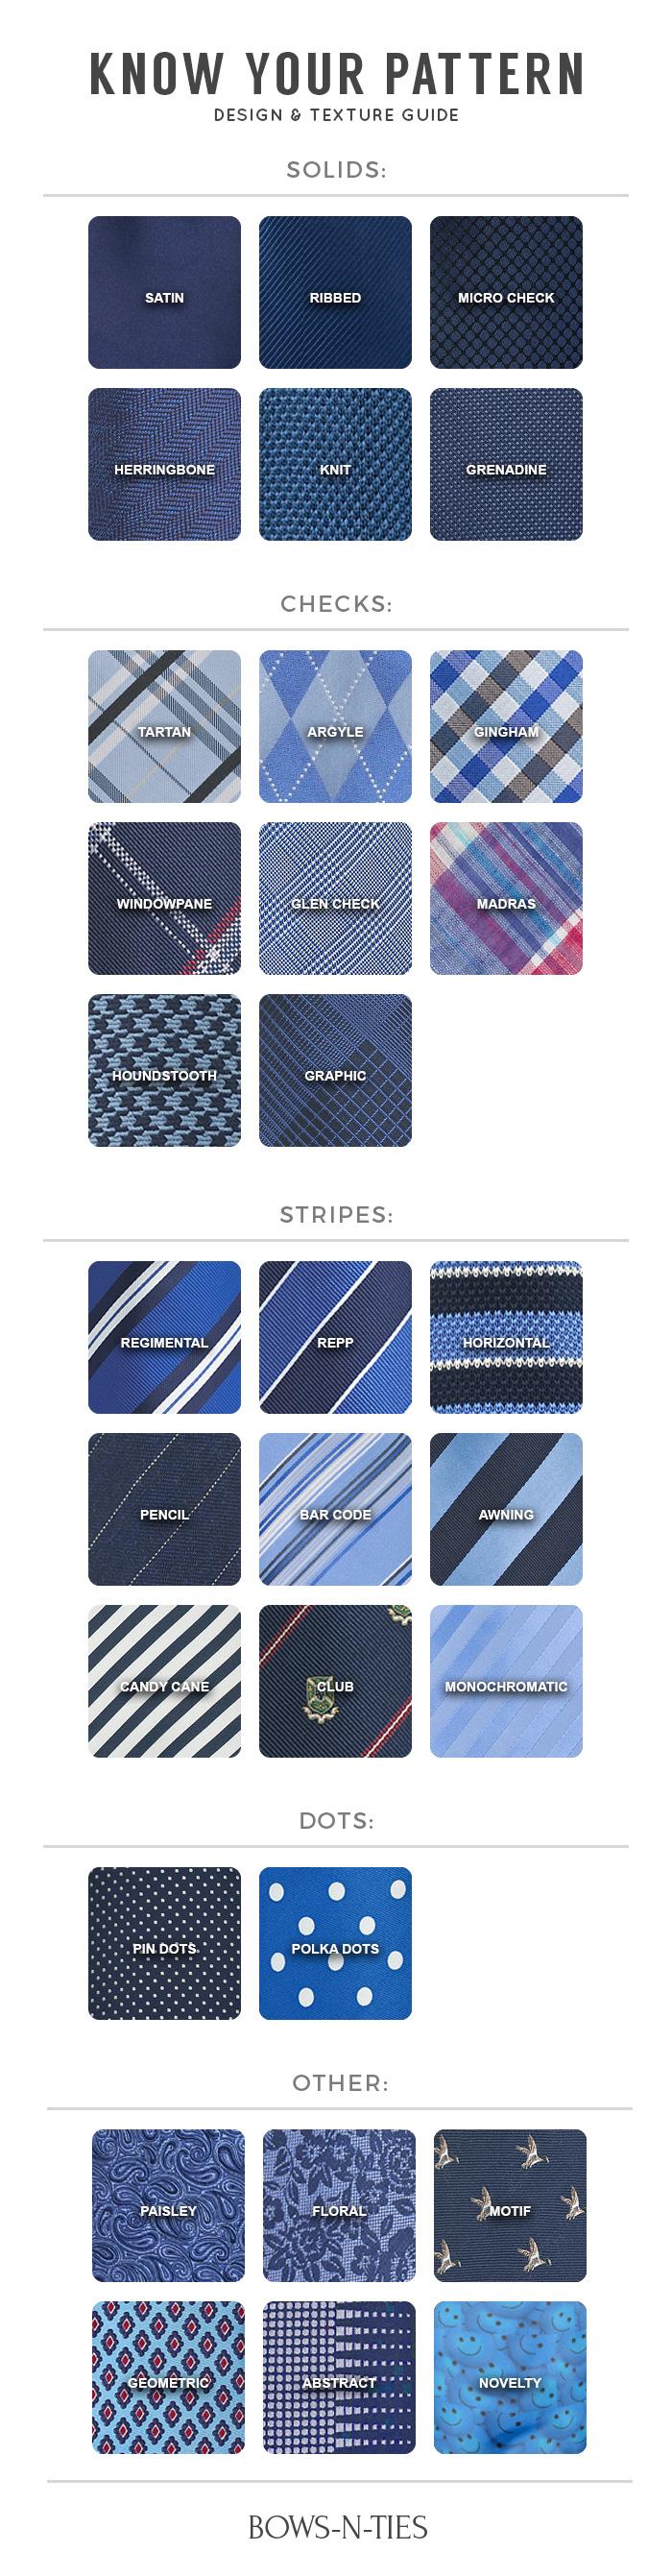 tie patterns 101 a complete guide to necktie patterns